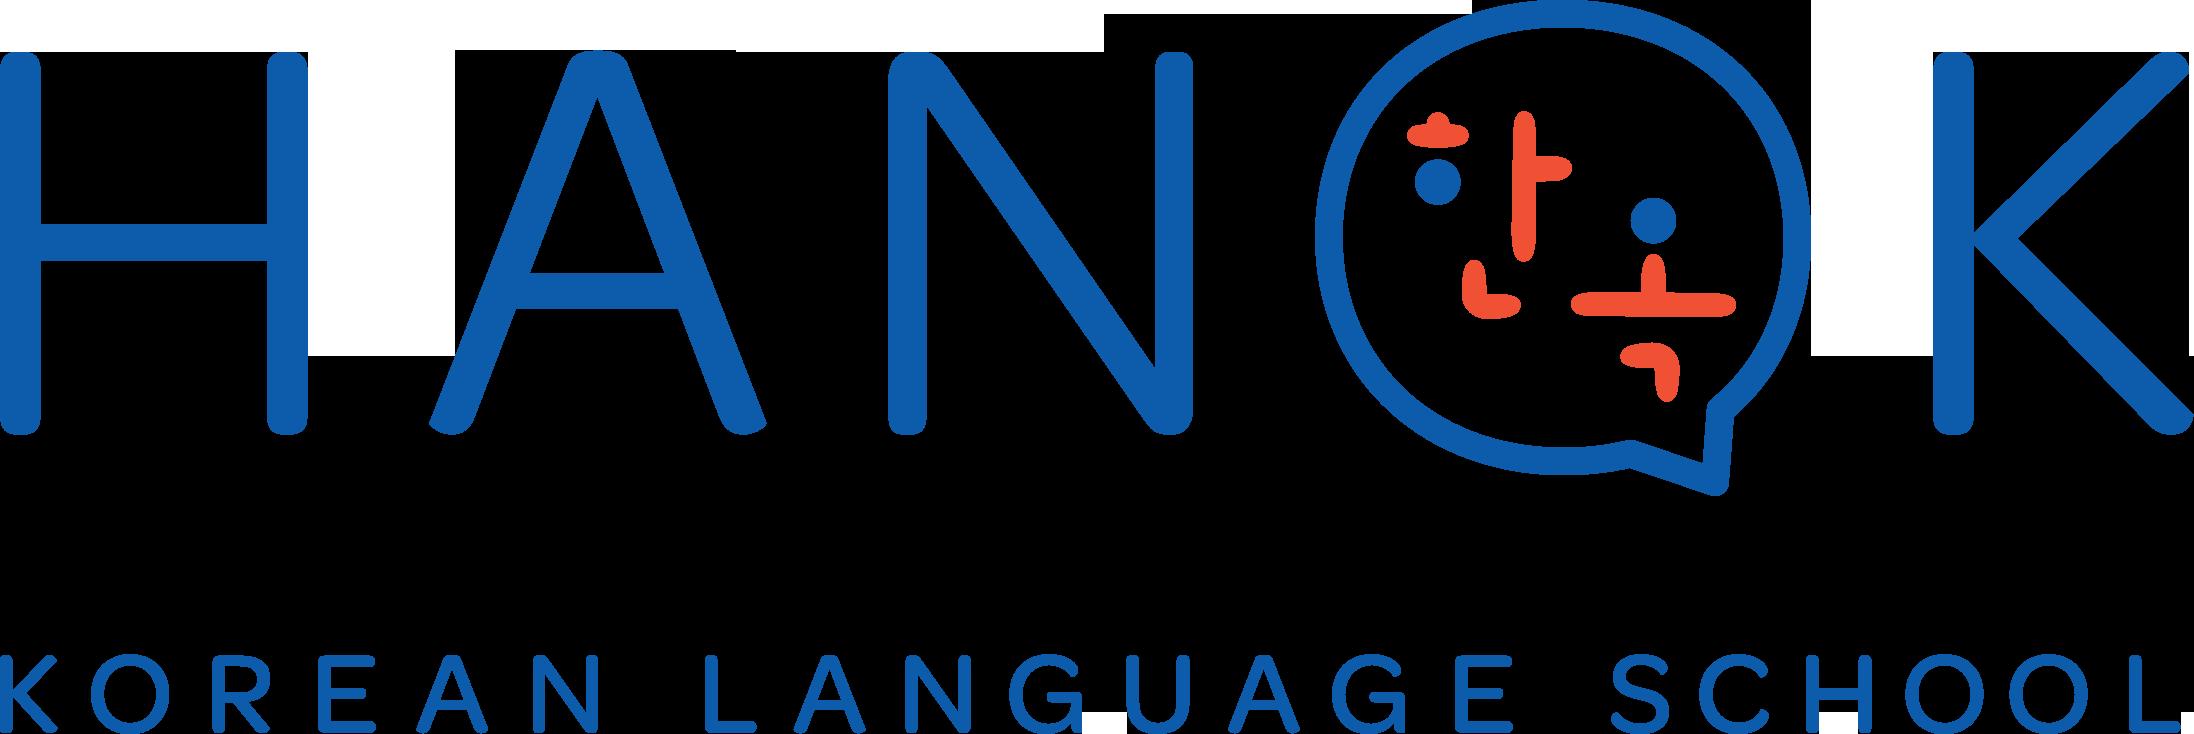 HANOK INTERMEDIATE 4 Qualification Test